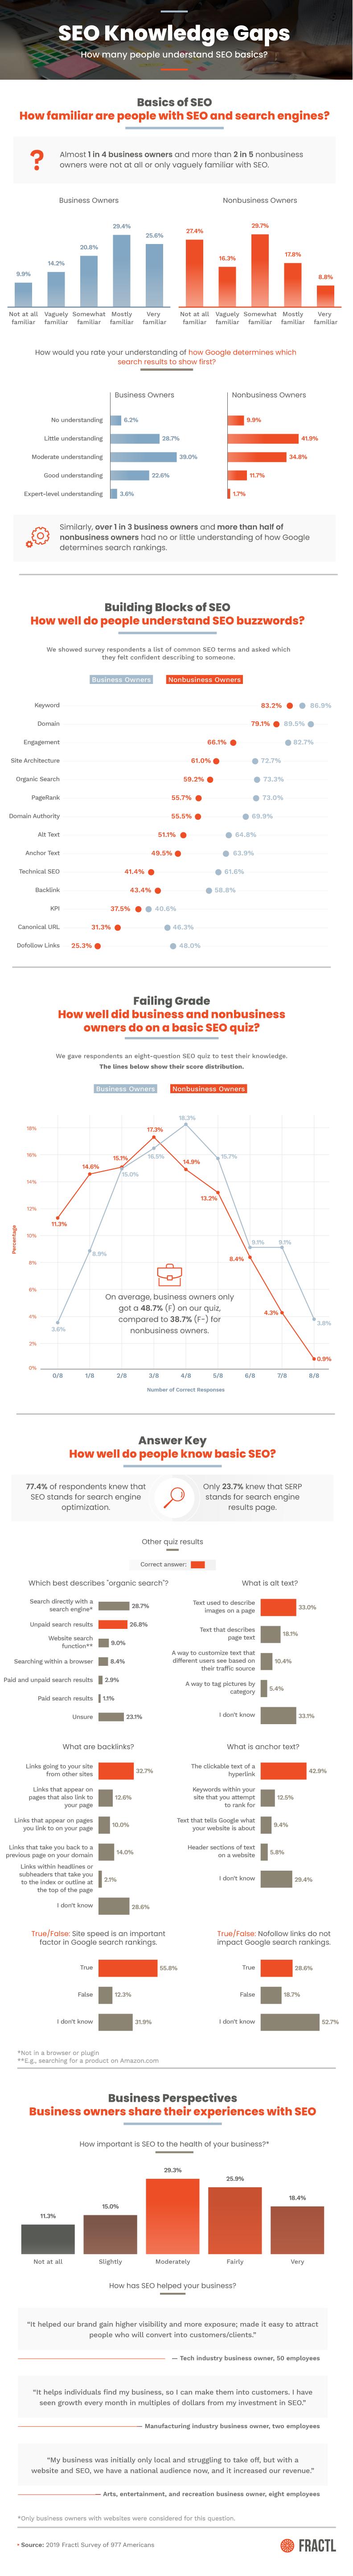 SEO knowledge gaps infographic